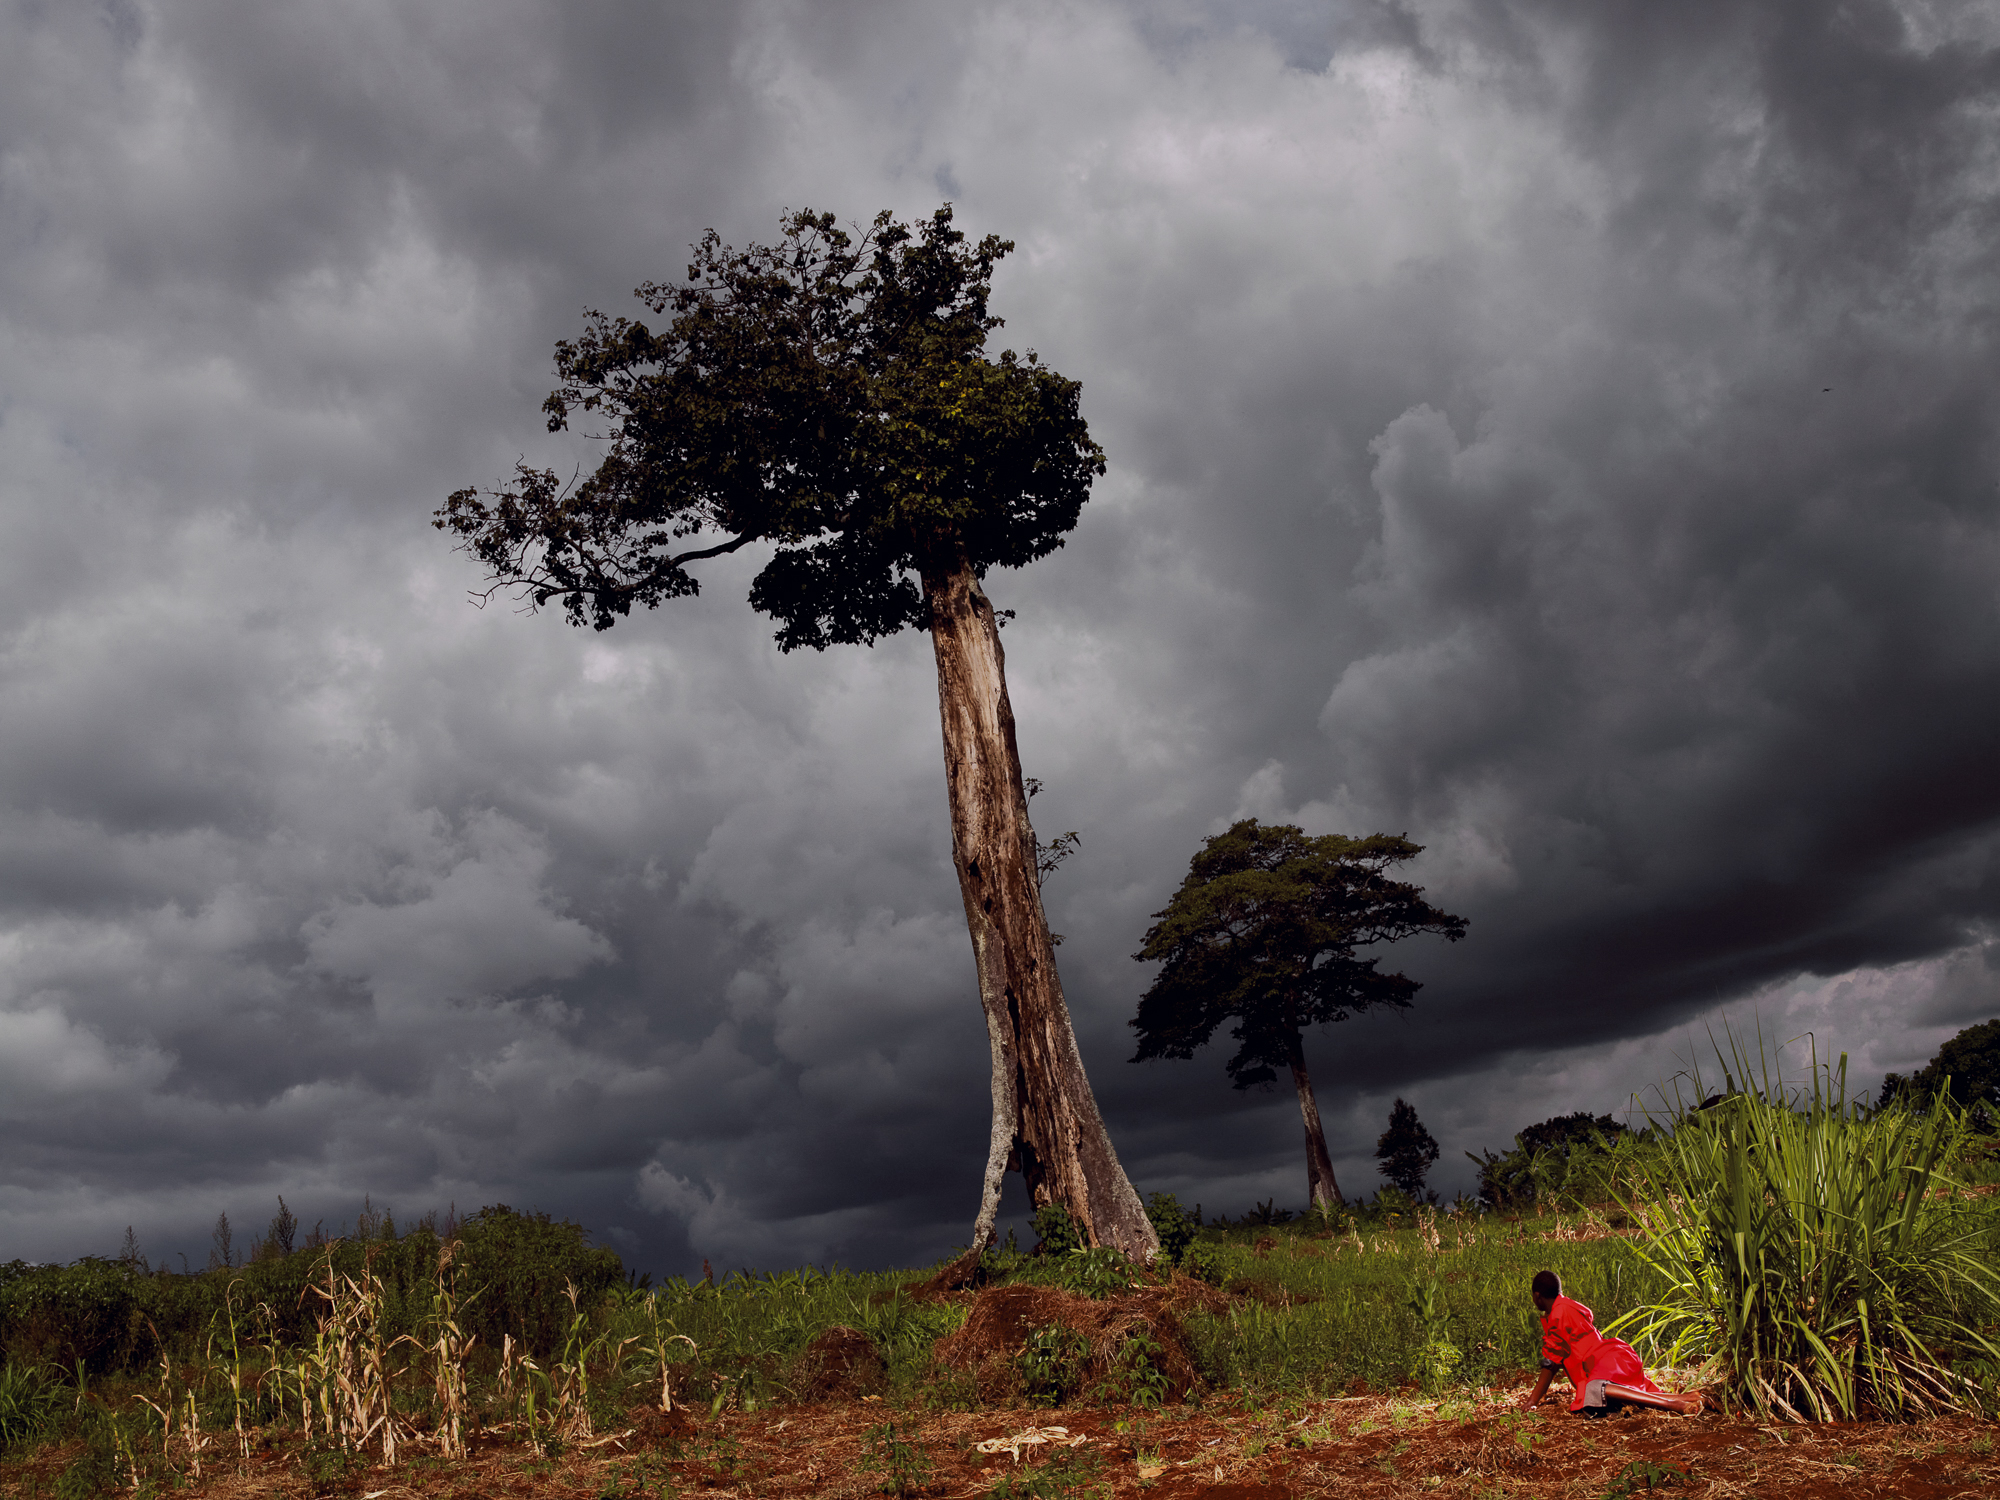 L'ARBRE FOUDROYÉ, RWANDA